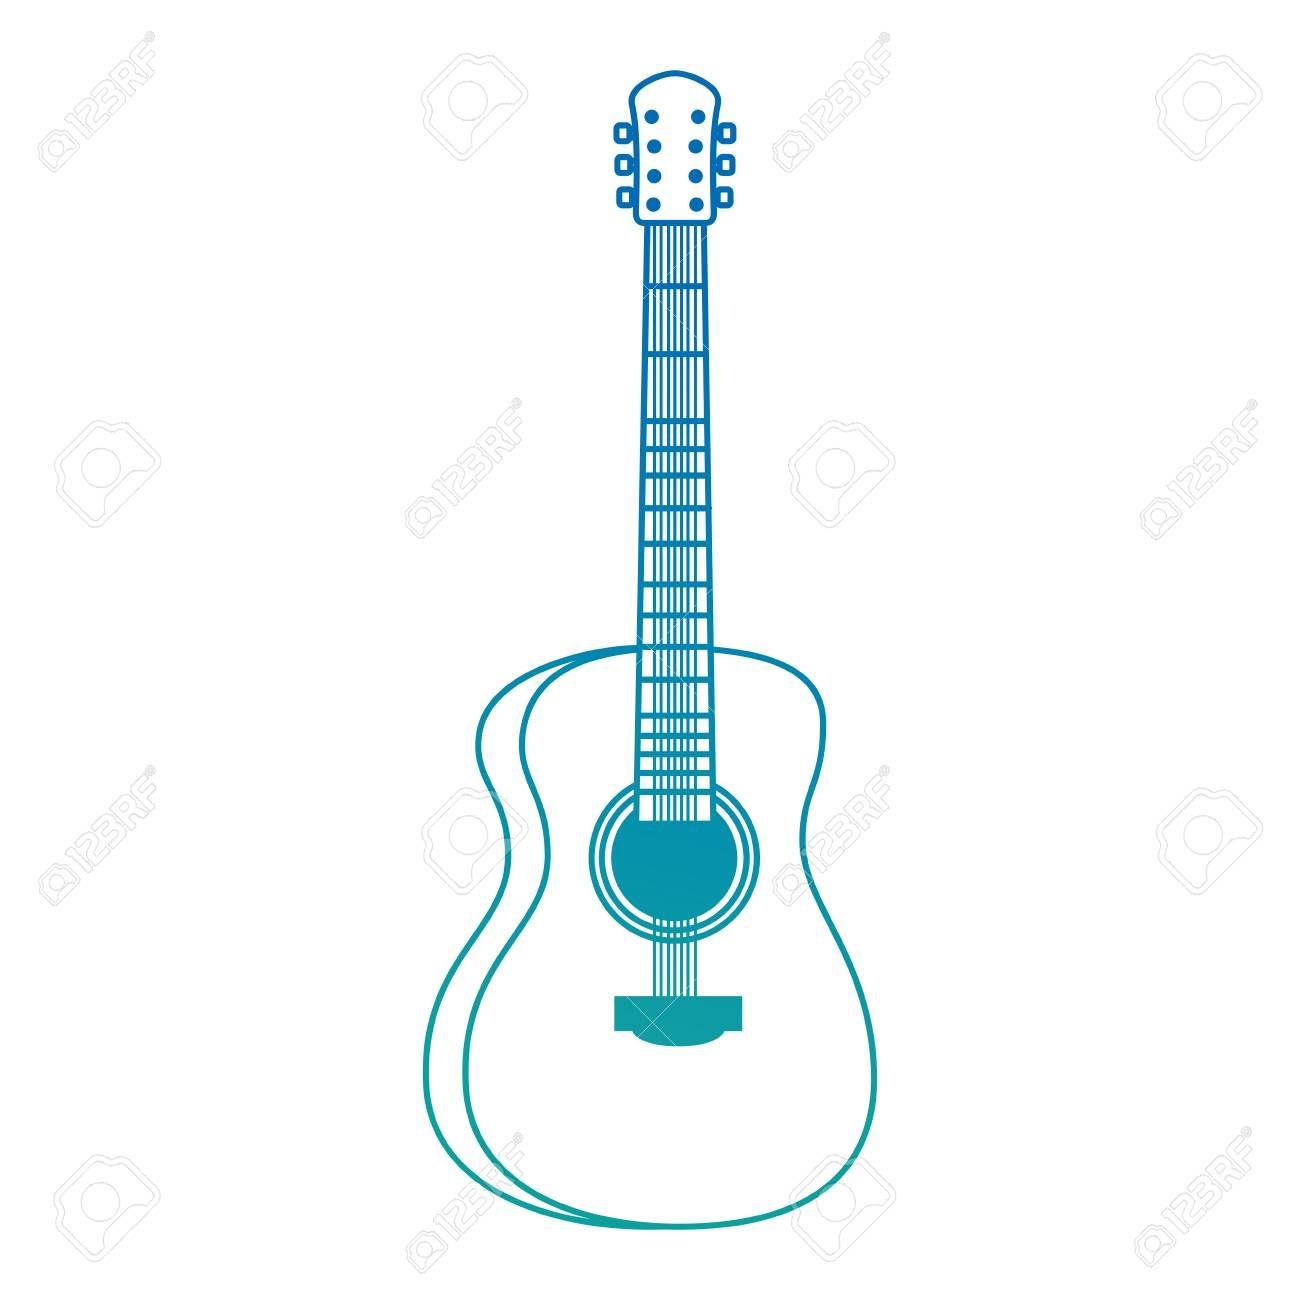 Acoustic Guitar Musical Instrument Vector Illustration Design Sponsored Musical Guitar Acoustic Instrument De Music Instruments Instruments Guitar